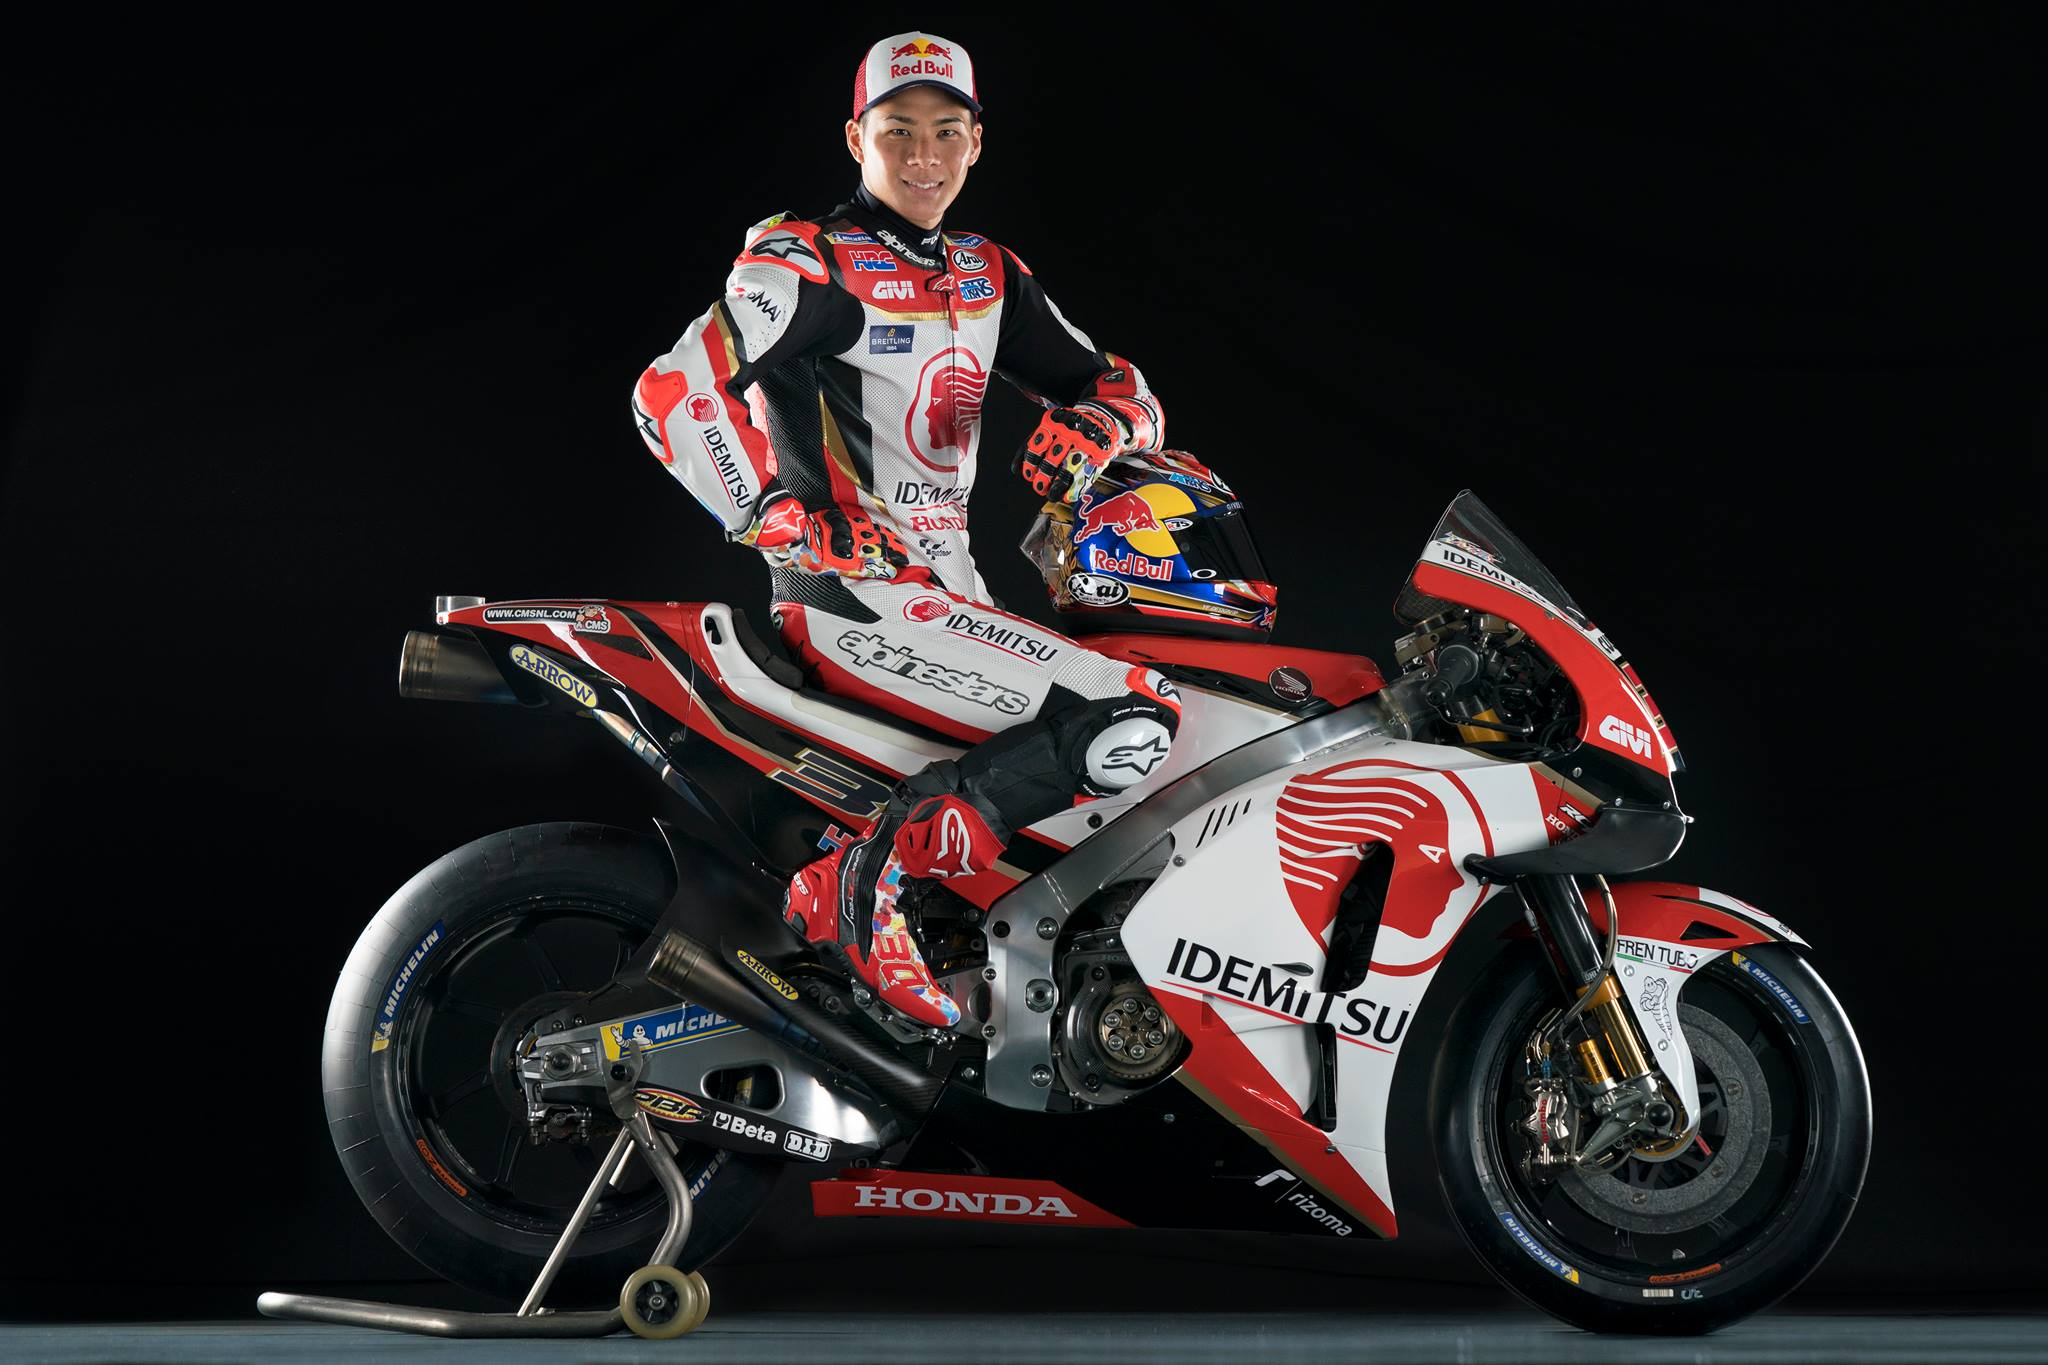 Takaaki Nakagami, LCR Honda MotoGP 2019